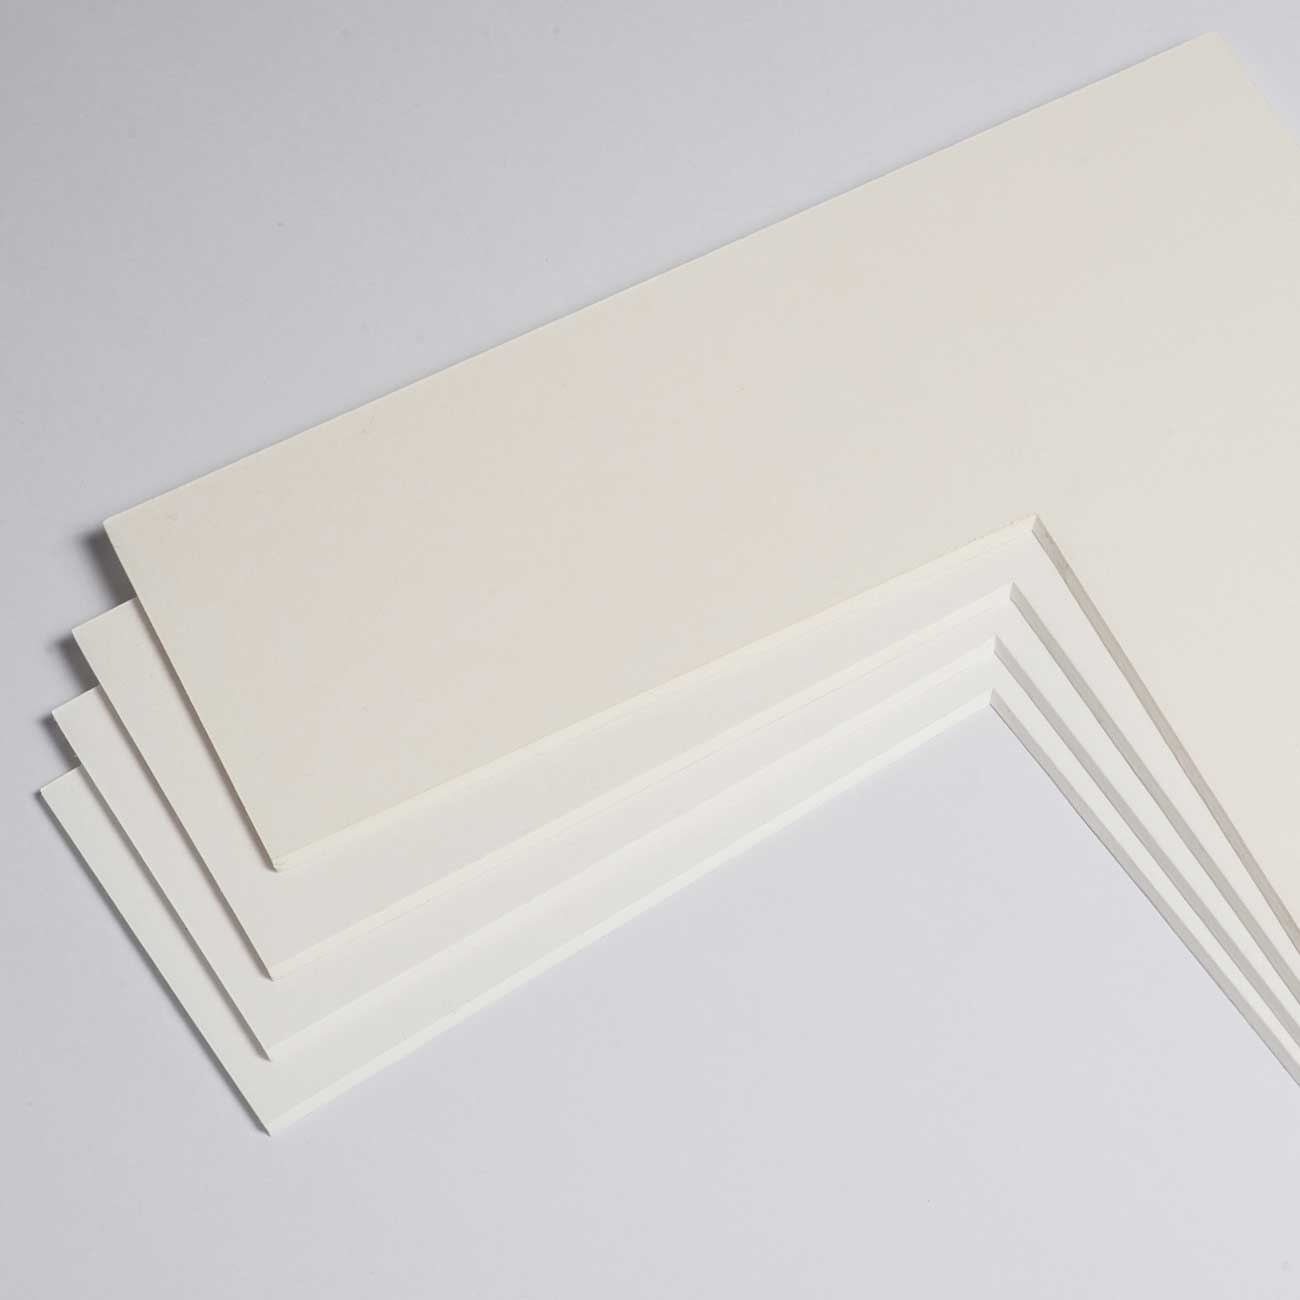 1,8 mm Baumwoll-Passepartout mit individuellem Ausschnitt